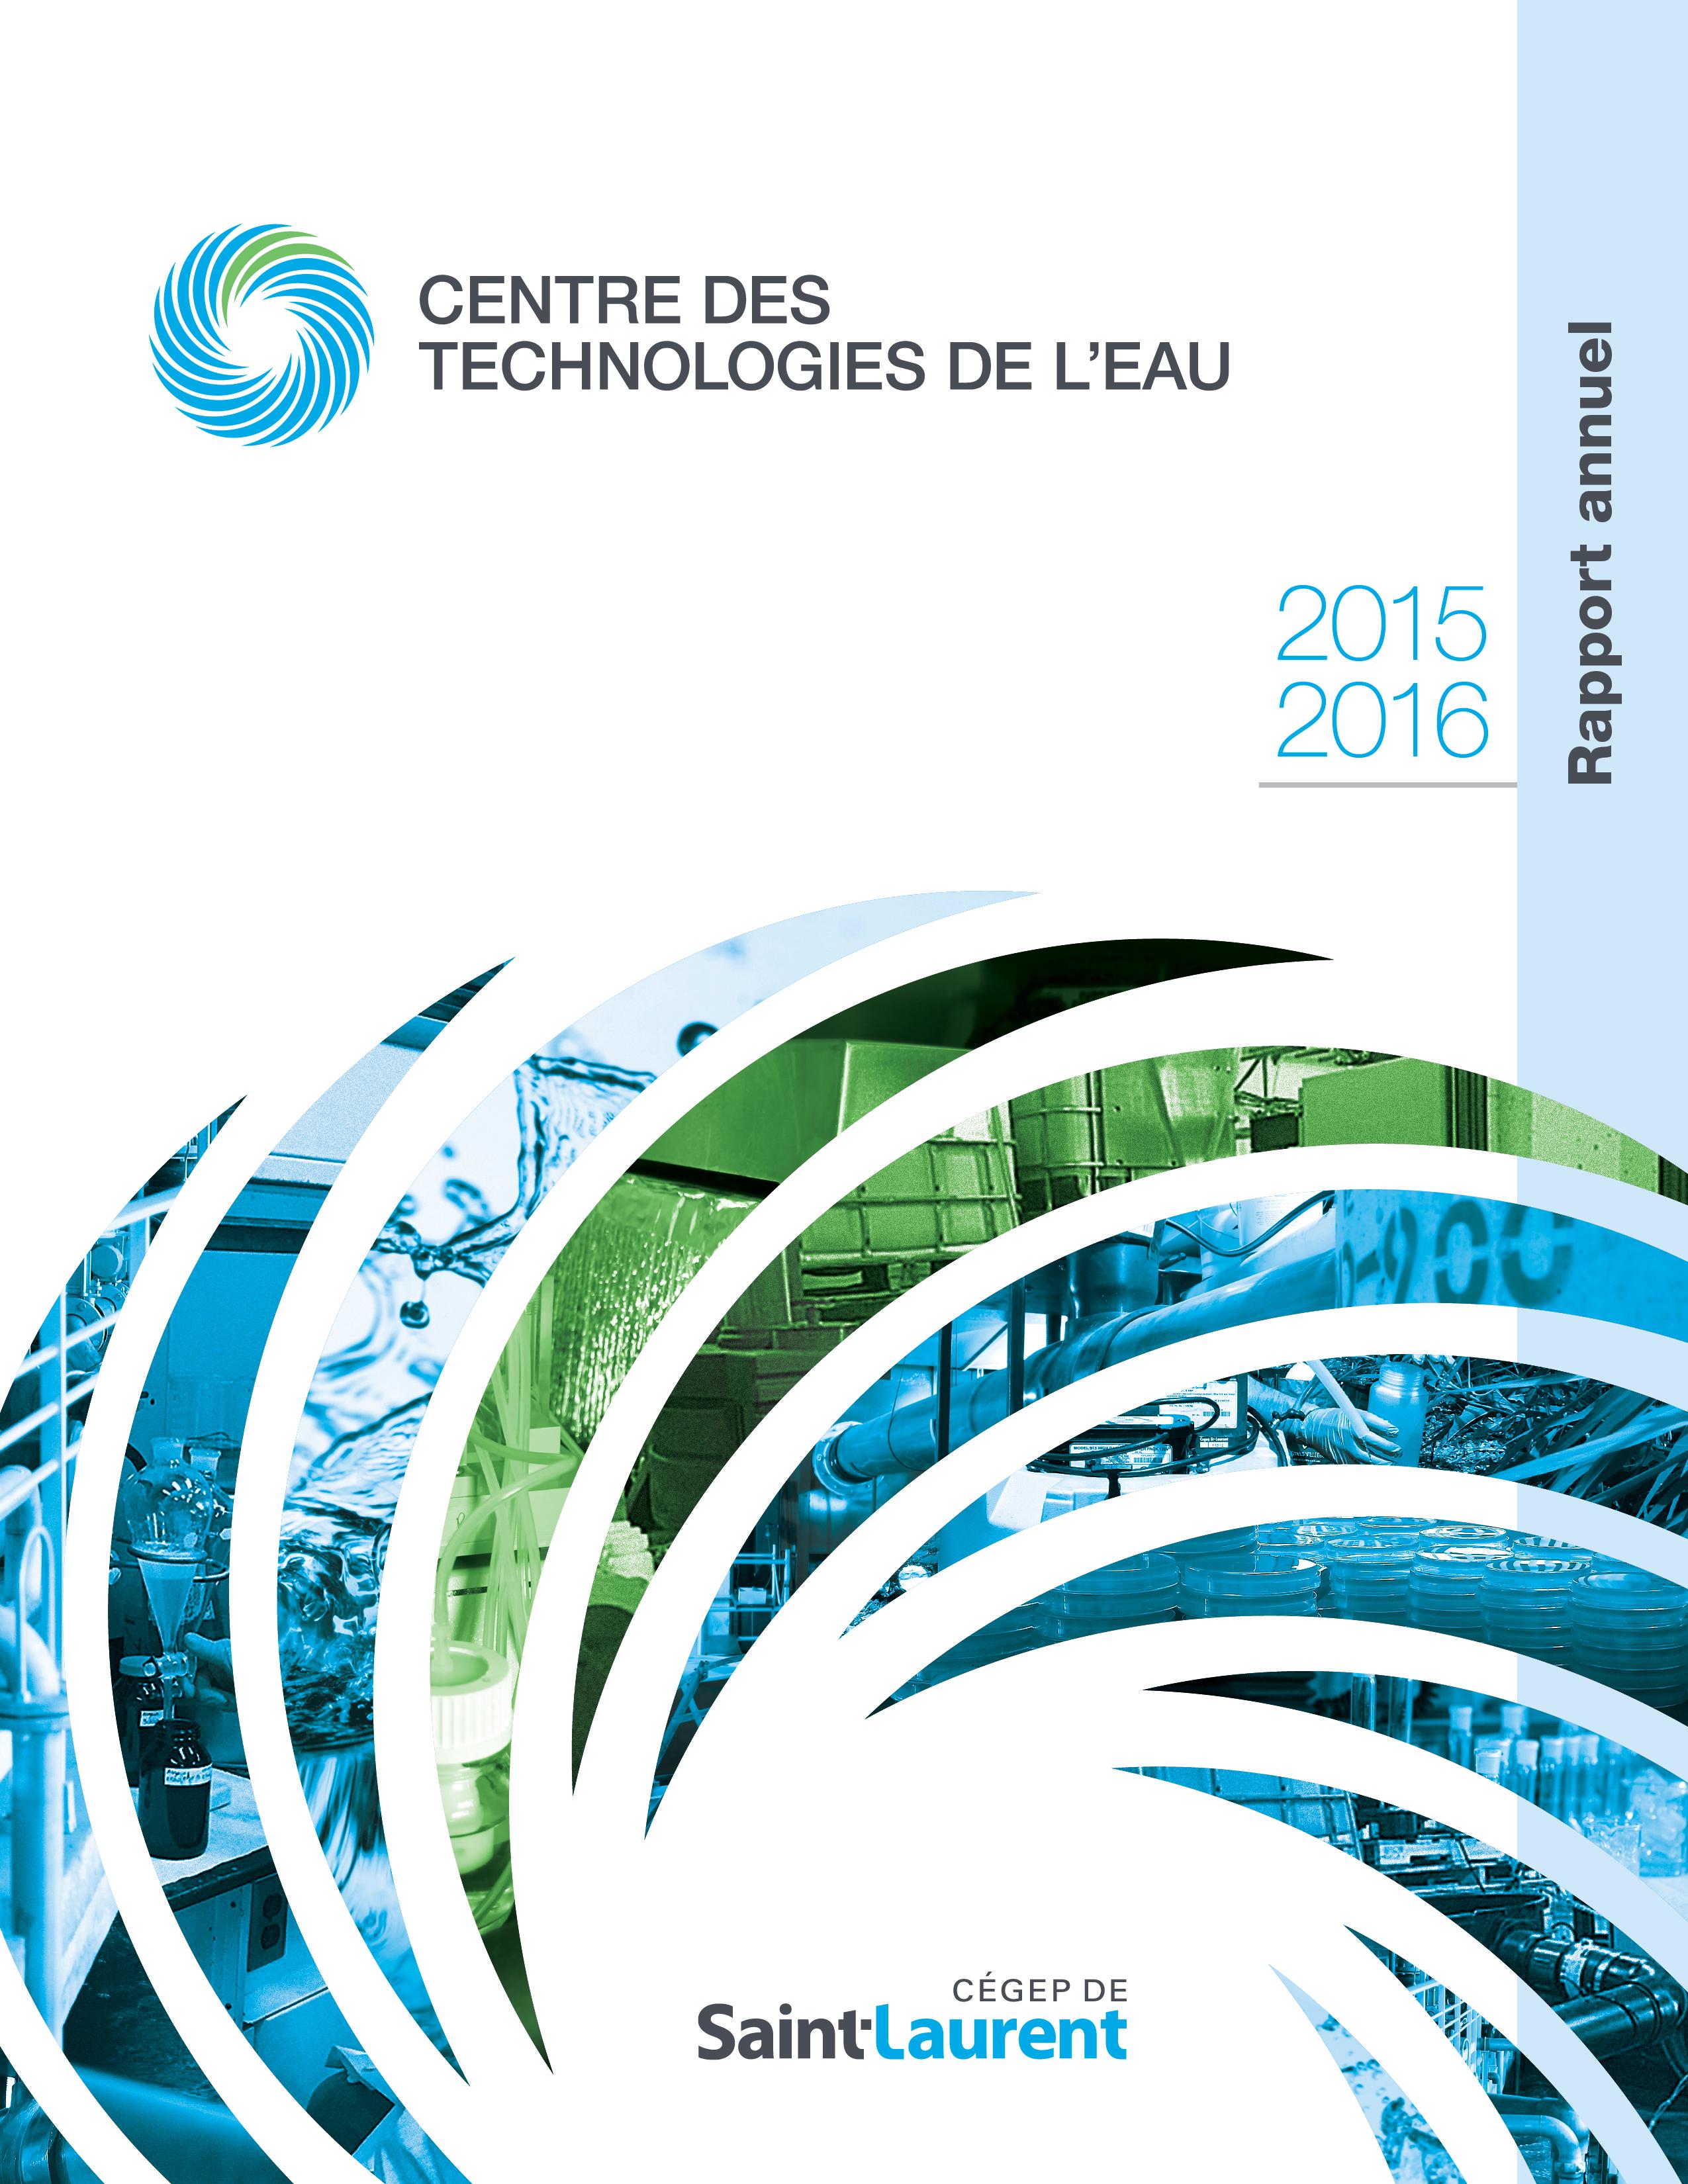 cteau-ra-2015-16-c1